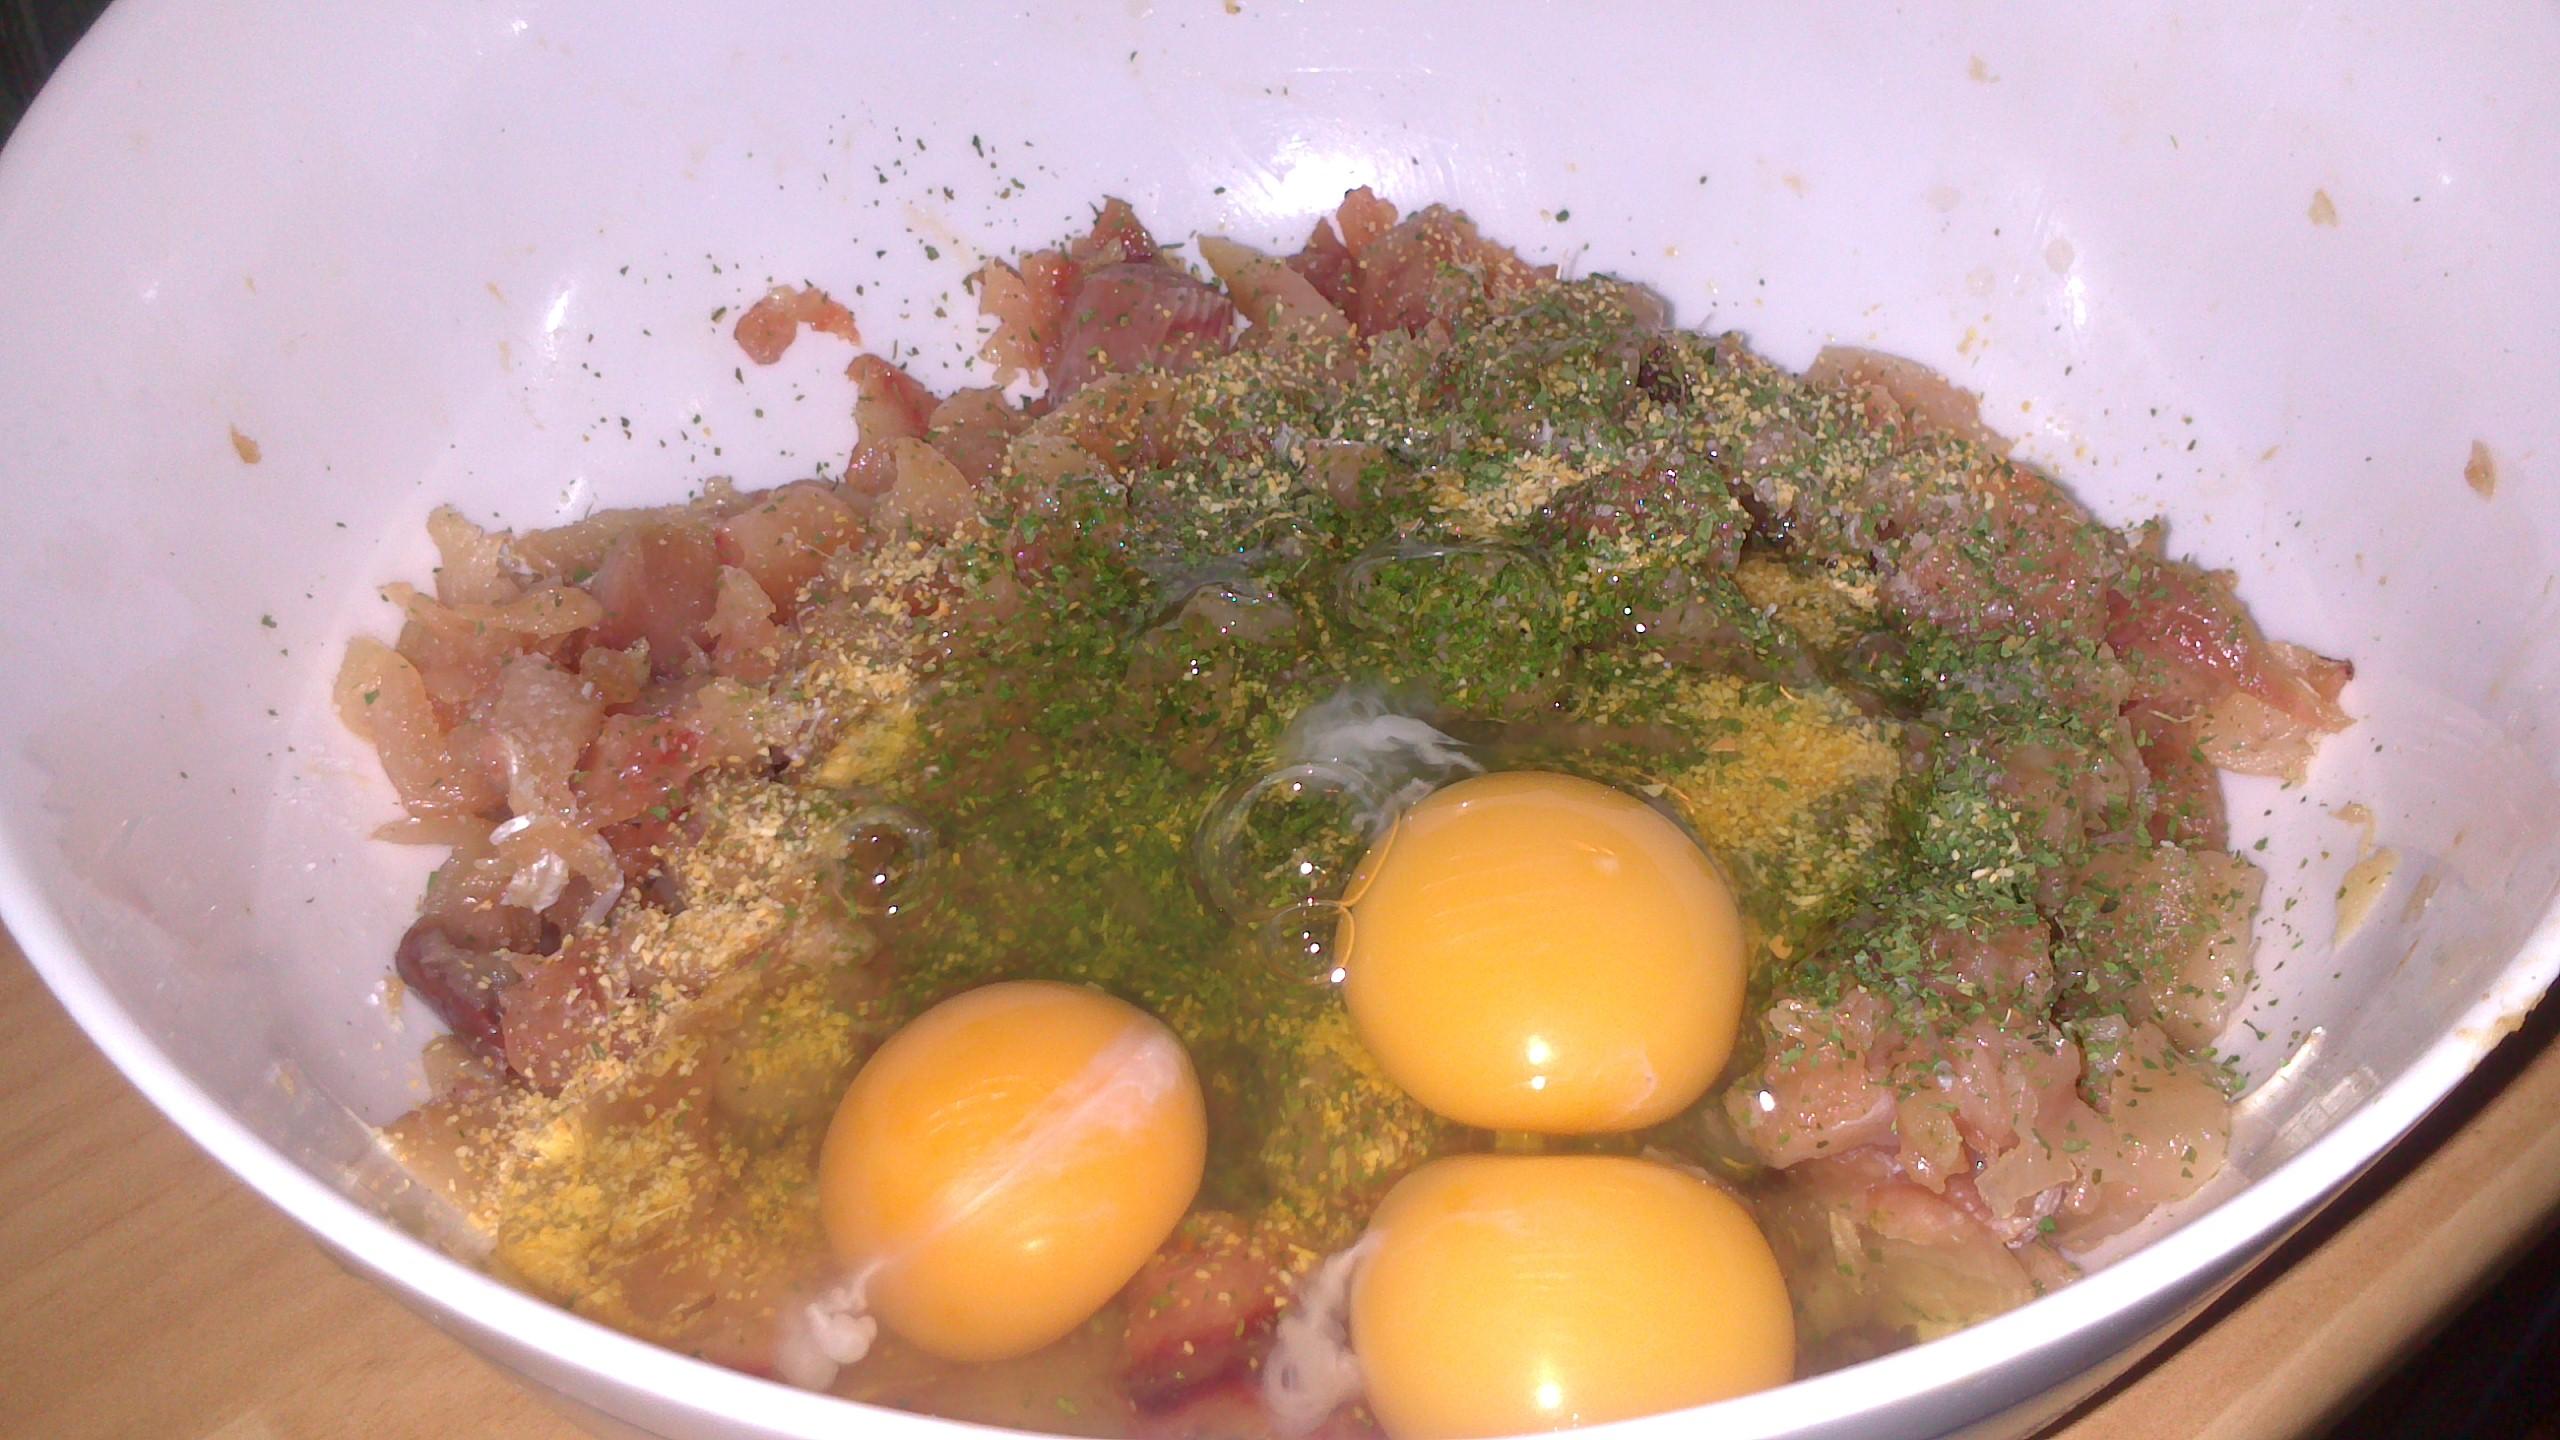 Albndigas de atn en salsa  La cocina de mi infancia